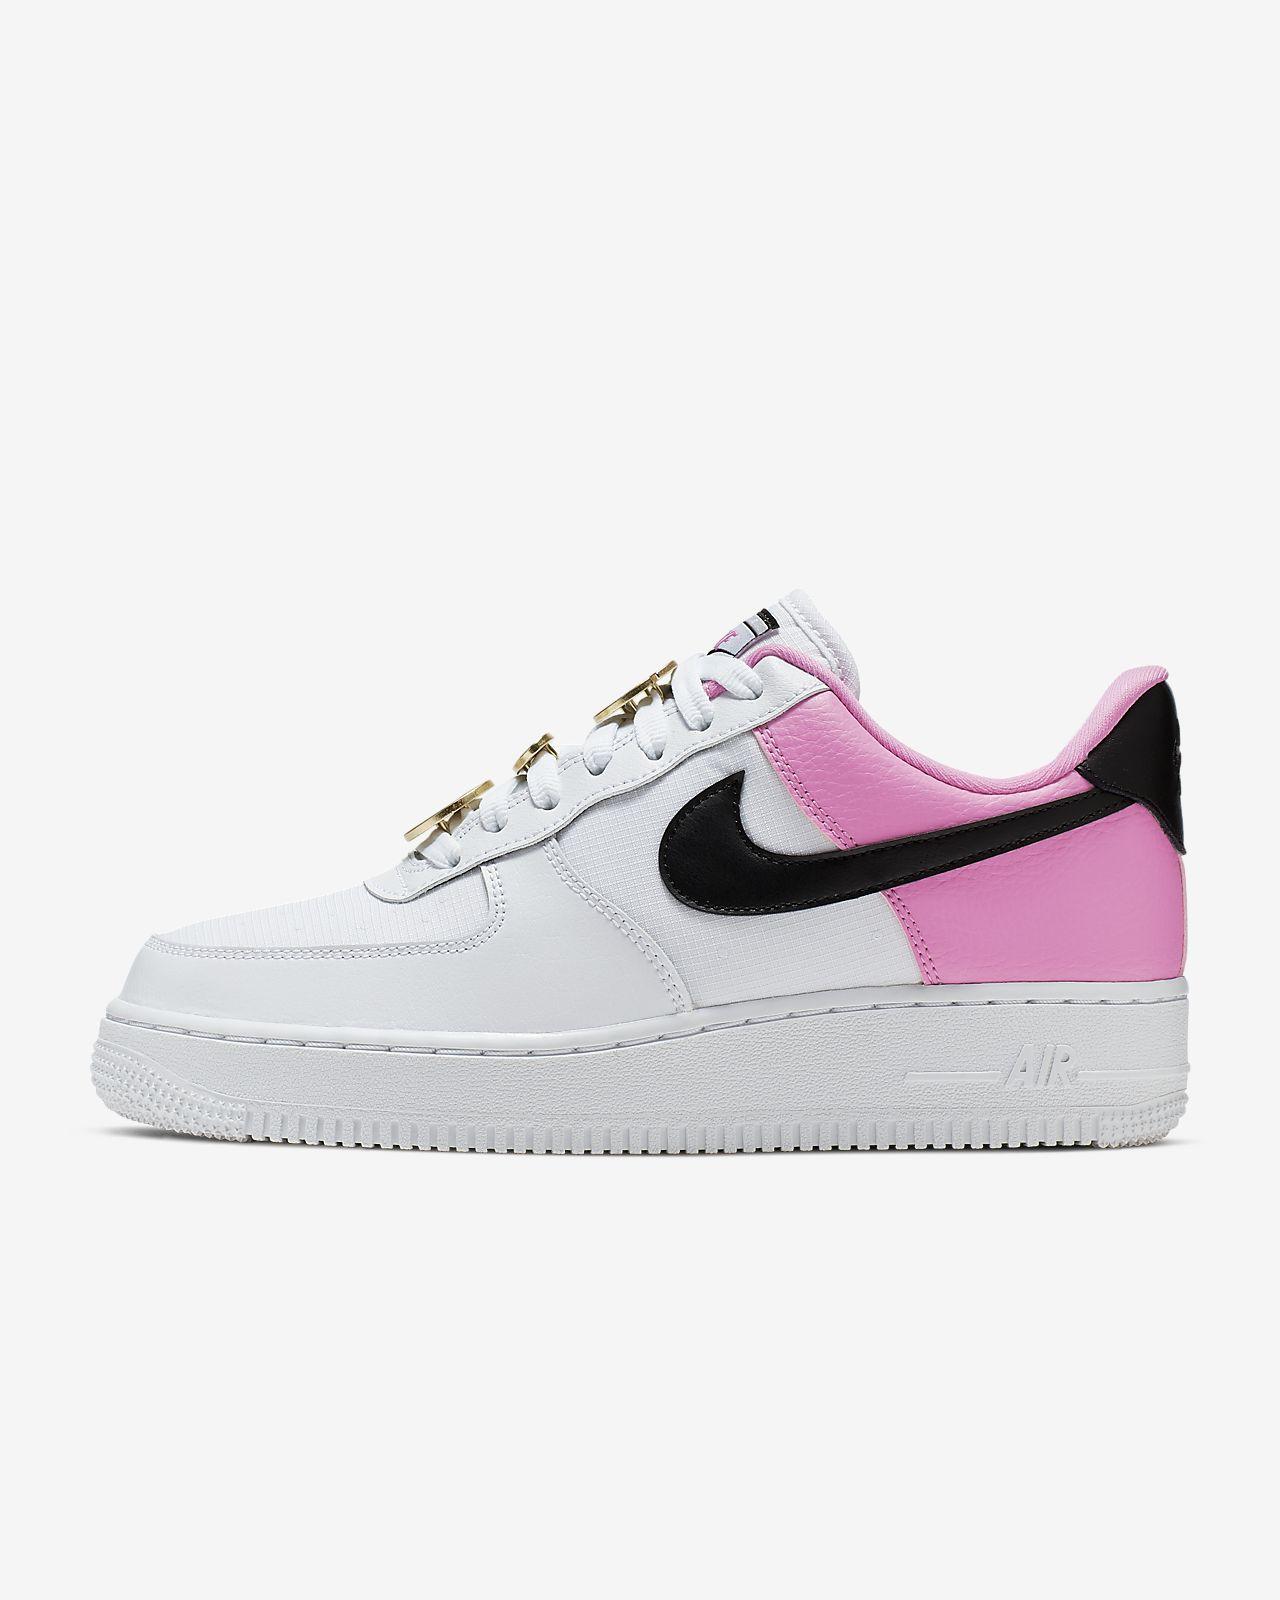 Nike Air Force 1 \u002707 SE Women\u0027s Shoe